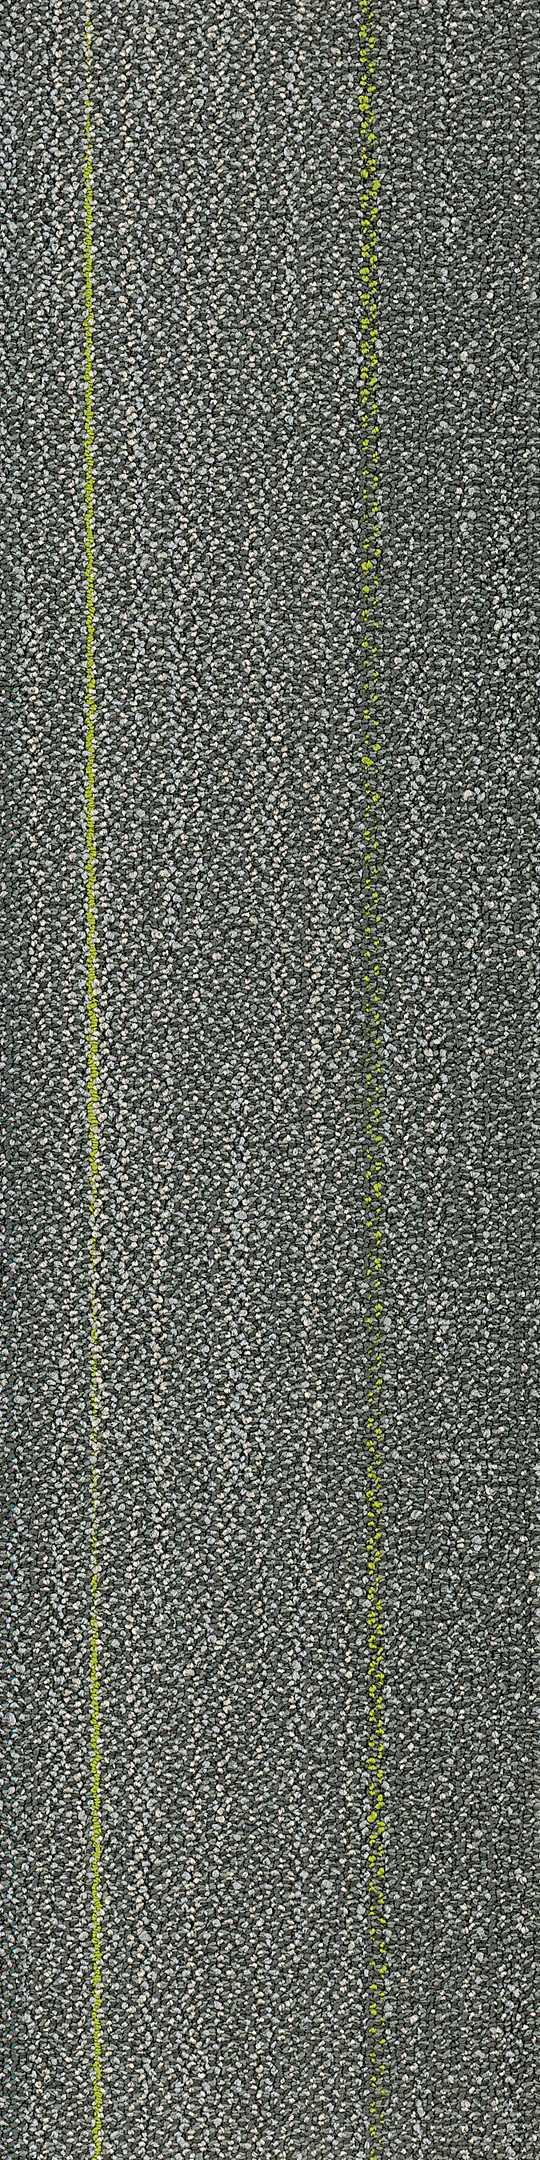 Shaw Central Line Carpet Tile Adventure Green